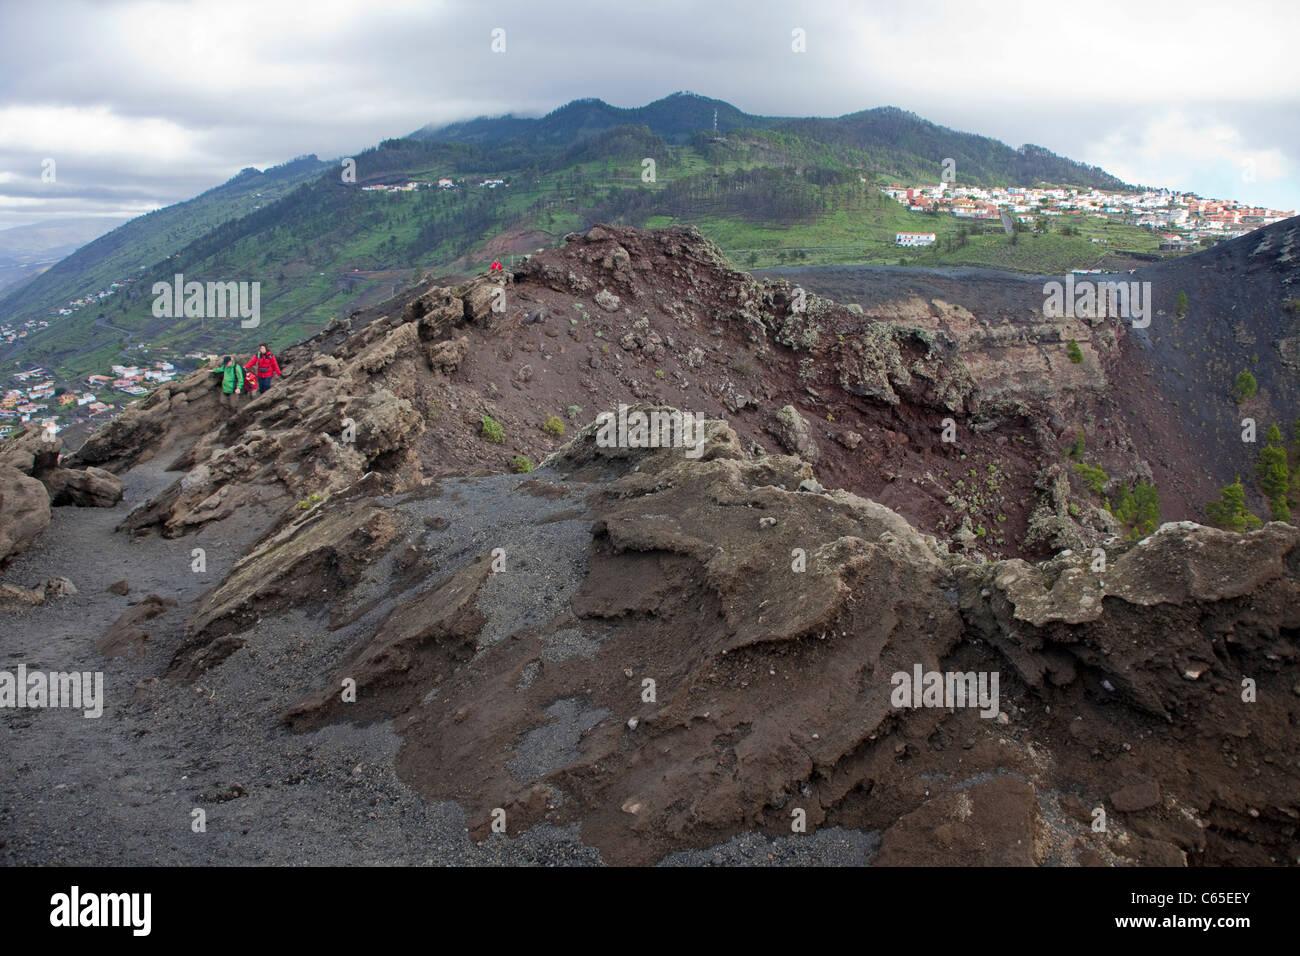 Blick in Den Vulkan San Antonio, Fuencaliente, Los Canarios, Blick in den Vulkan San Antonio, Fuencaliente Stockbild